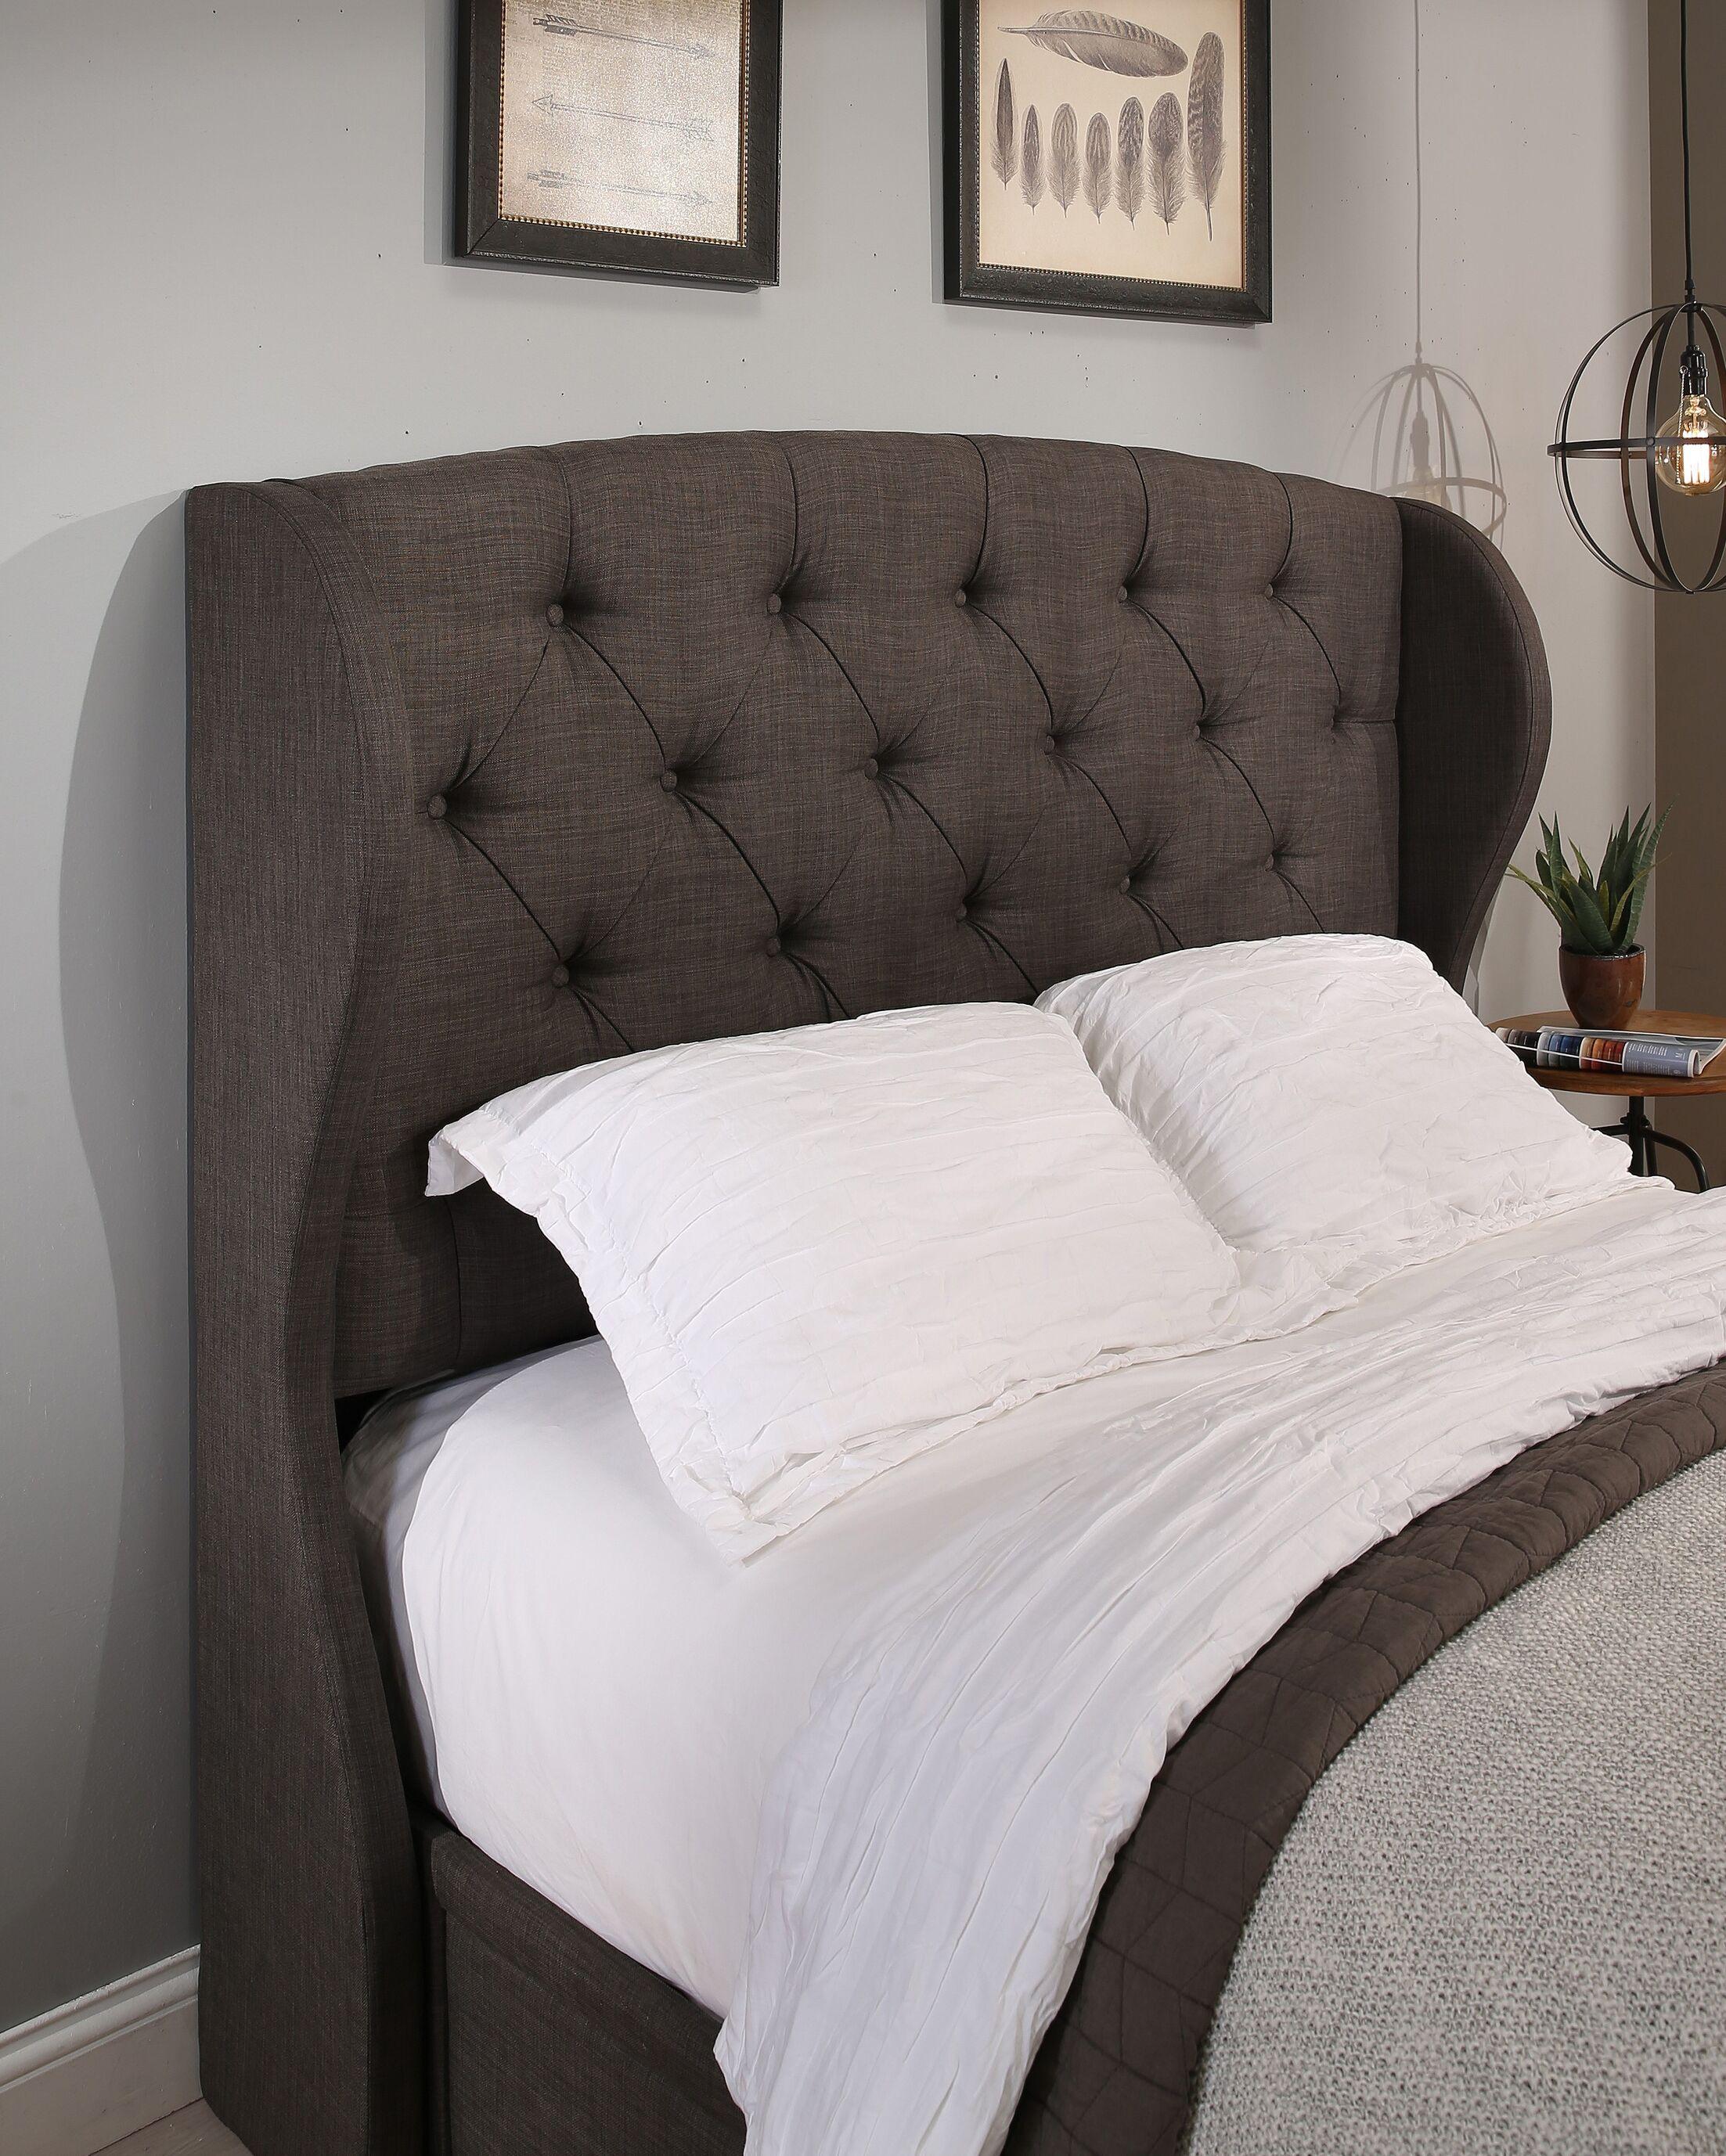 Sornson Upholstered Wingback Headboard Size: King/California King, Color: Biege